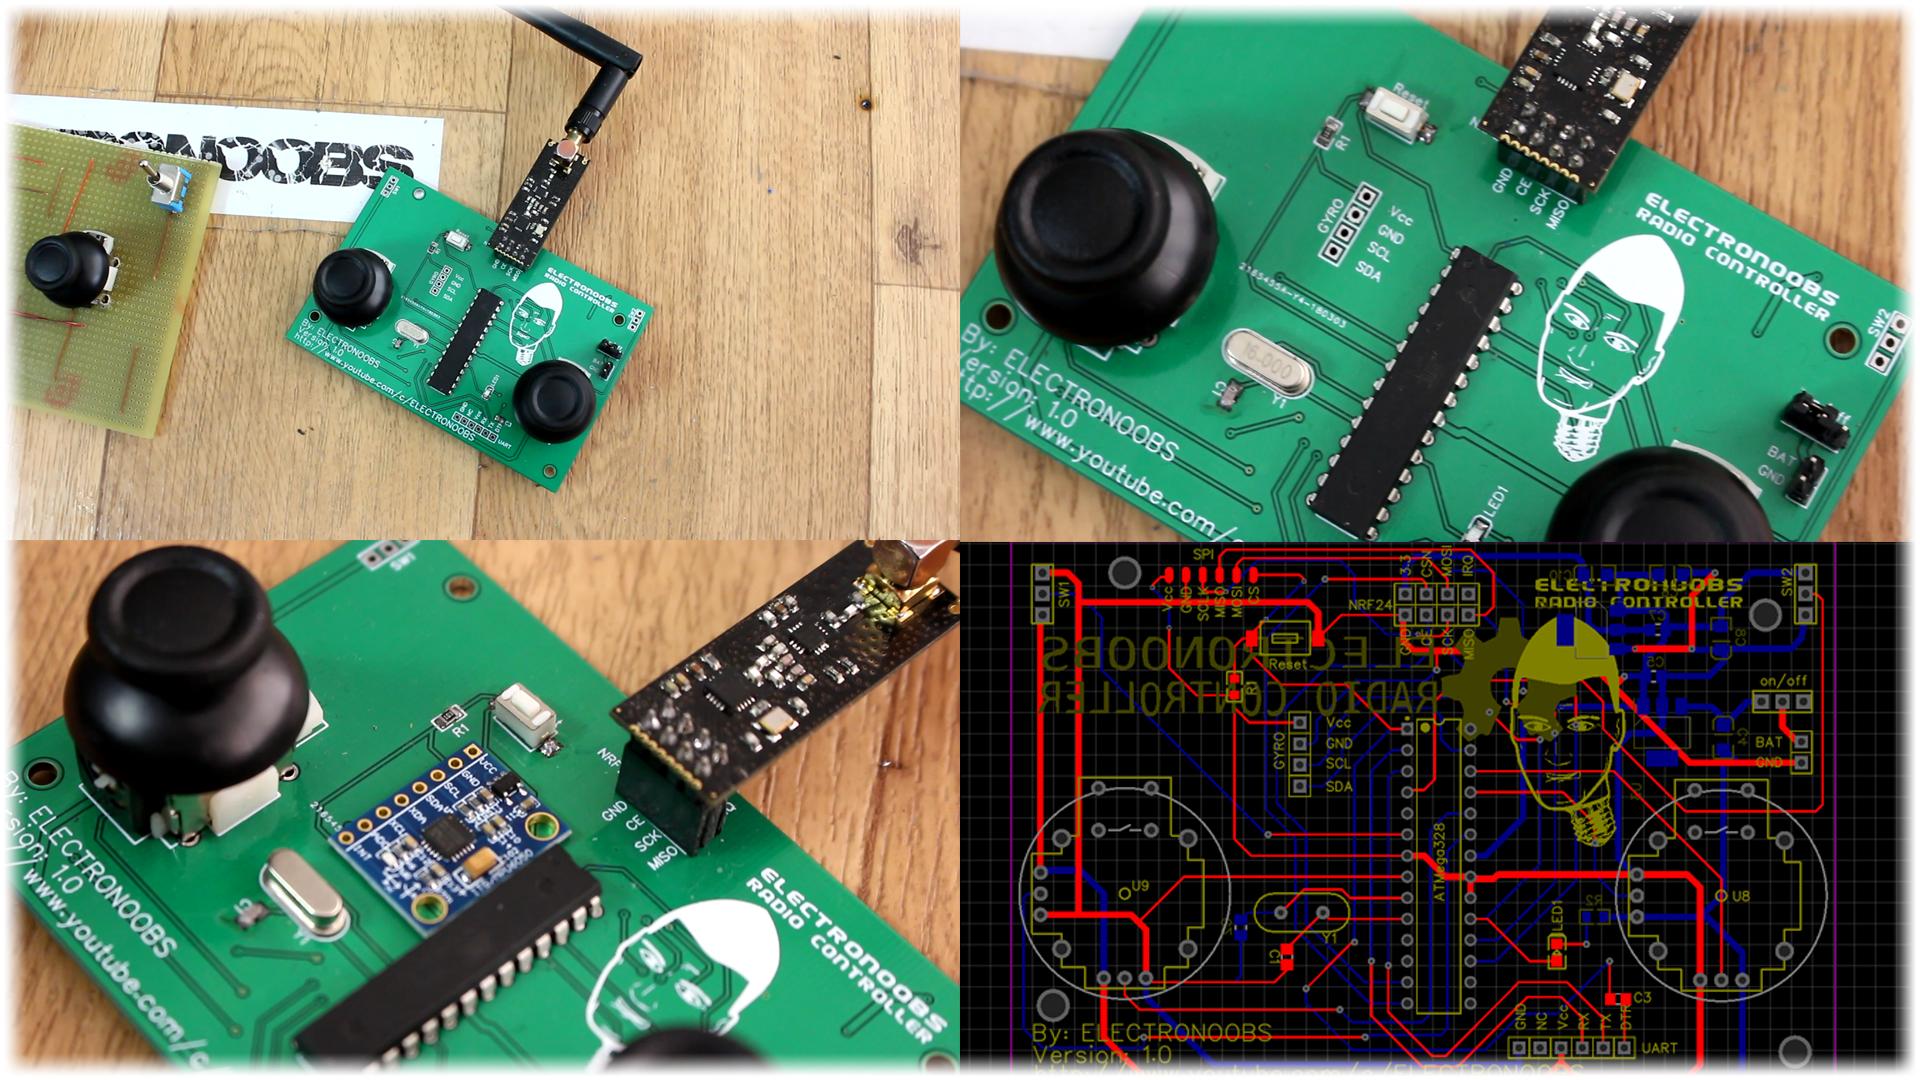 Arduino Radio Controller Diy Nrf24 Making A Circuit Board From Scratch Youtube Transmitter